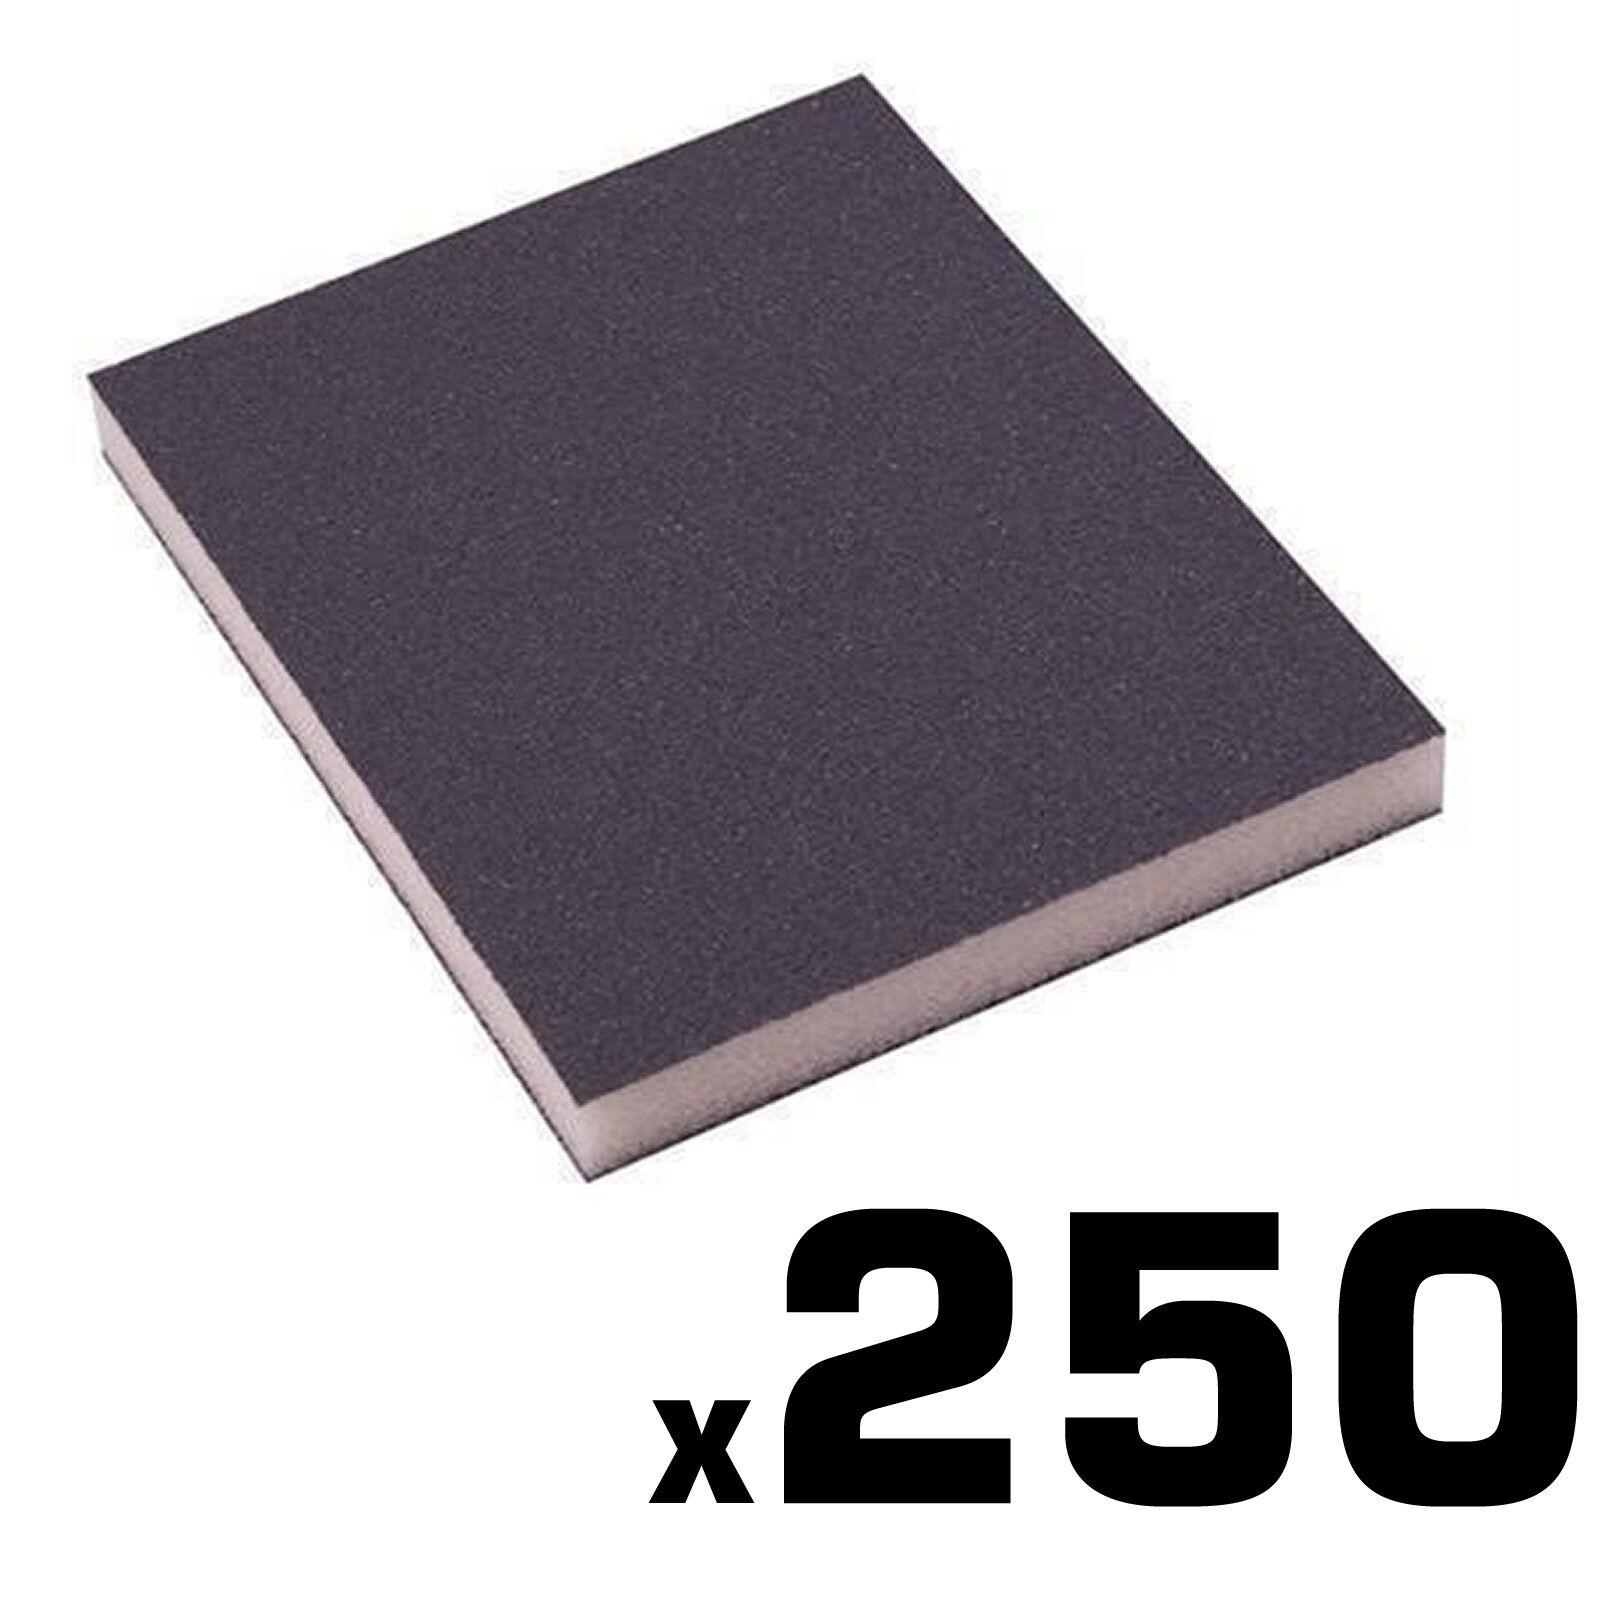 250 x Trade Flexible Sanding Pads Medium Grade Grit Wet and Dry Wood Paint Metal